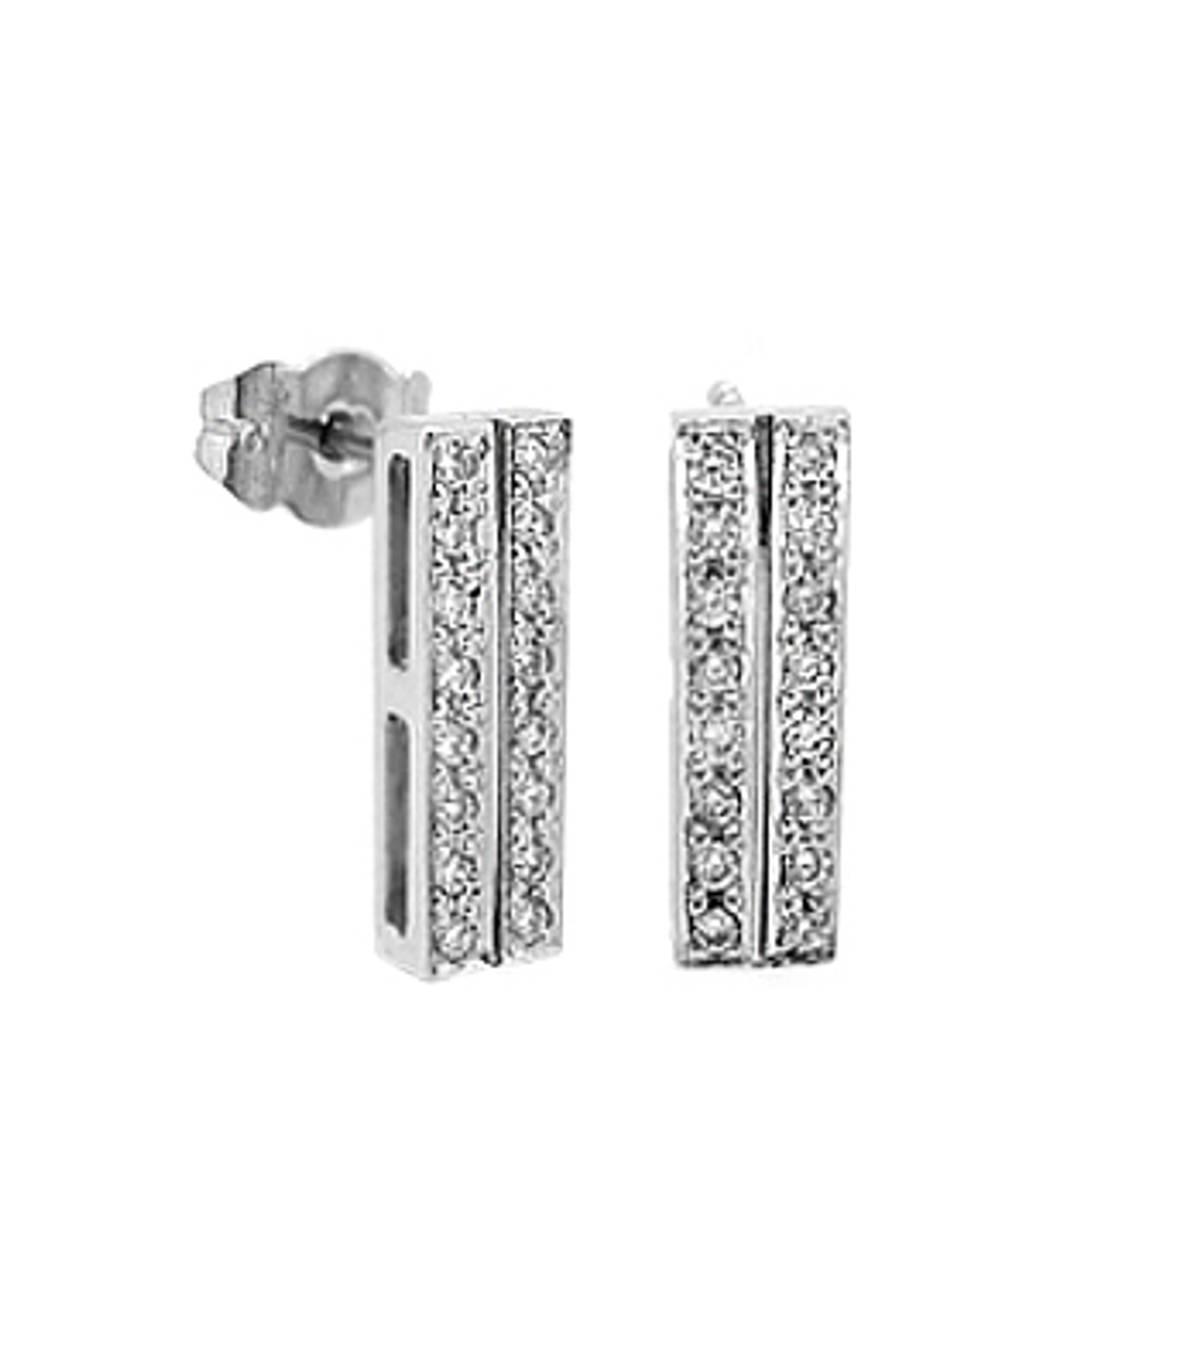 18 carat white gold 2 row diamond bar earrings diamond carat weight 0.25 caratwidth 0.4cm length 1.4cm